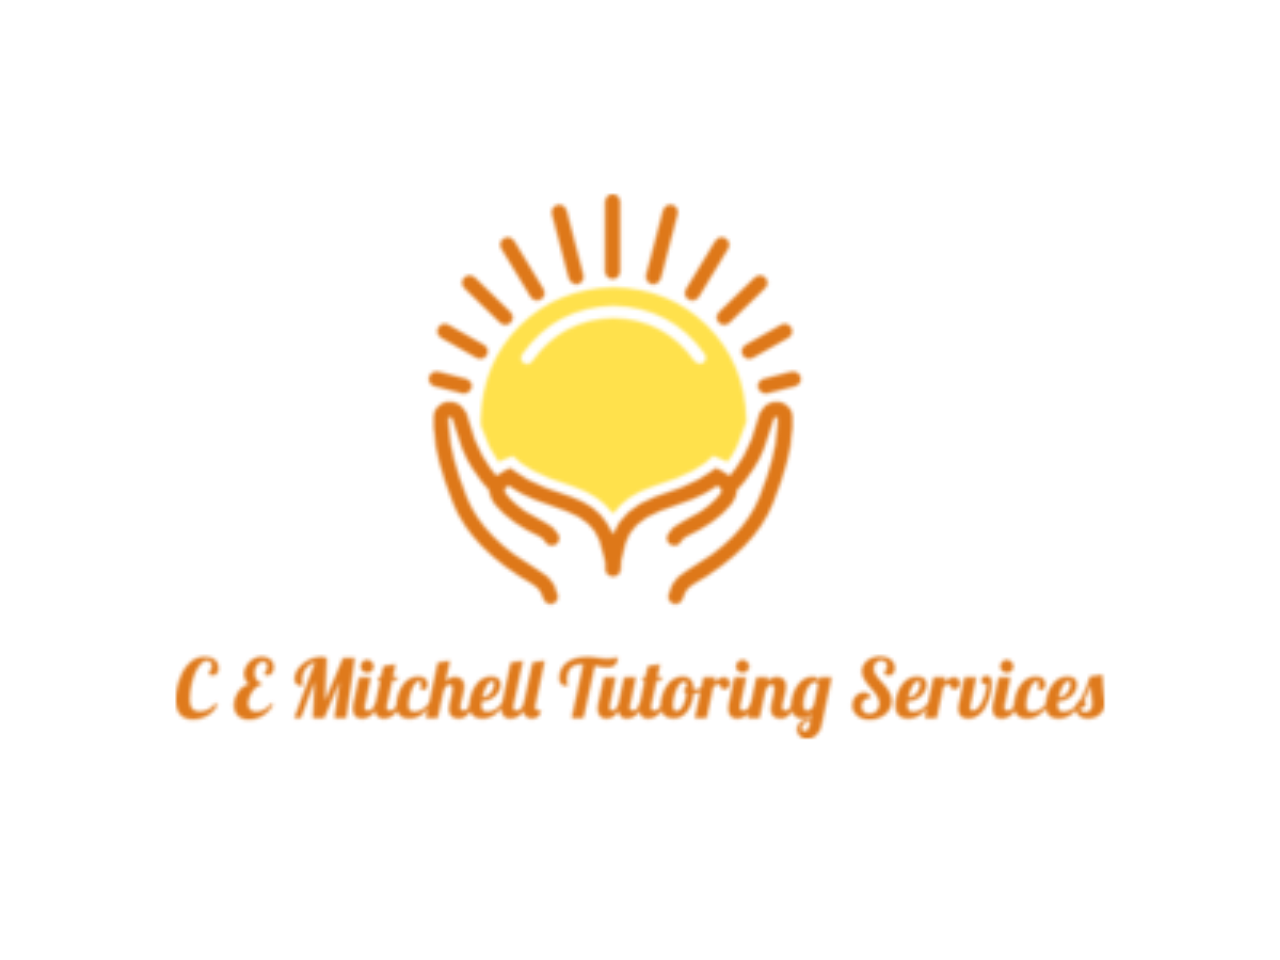 CE Mitchell Tutoring Services